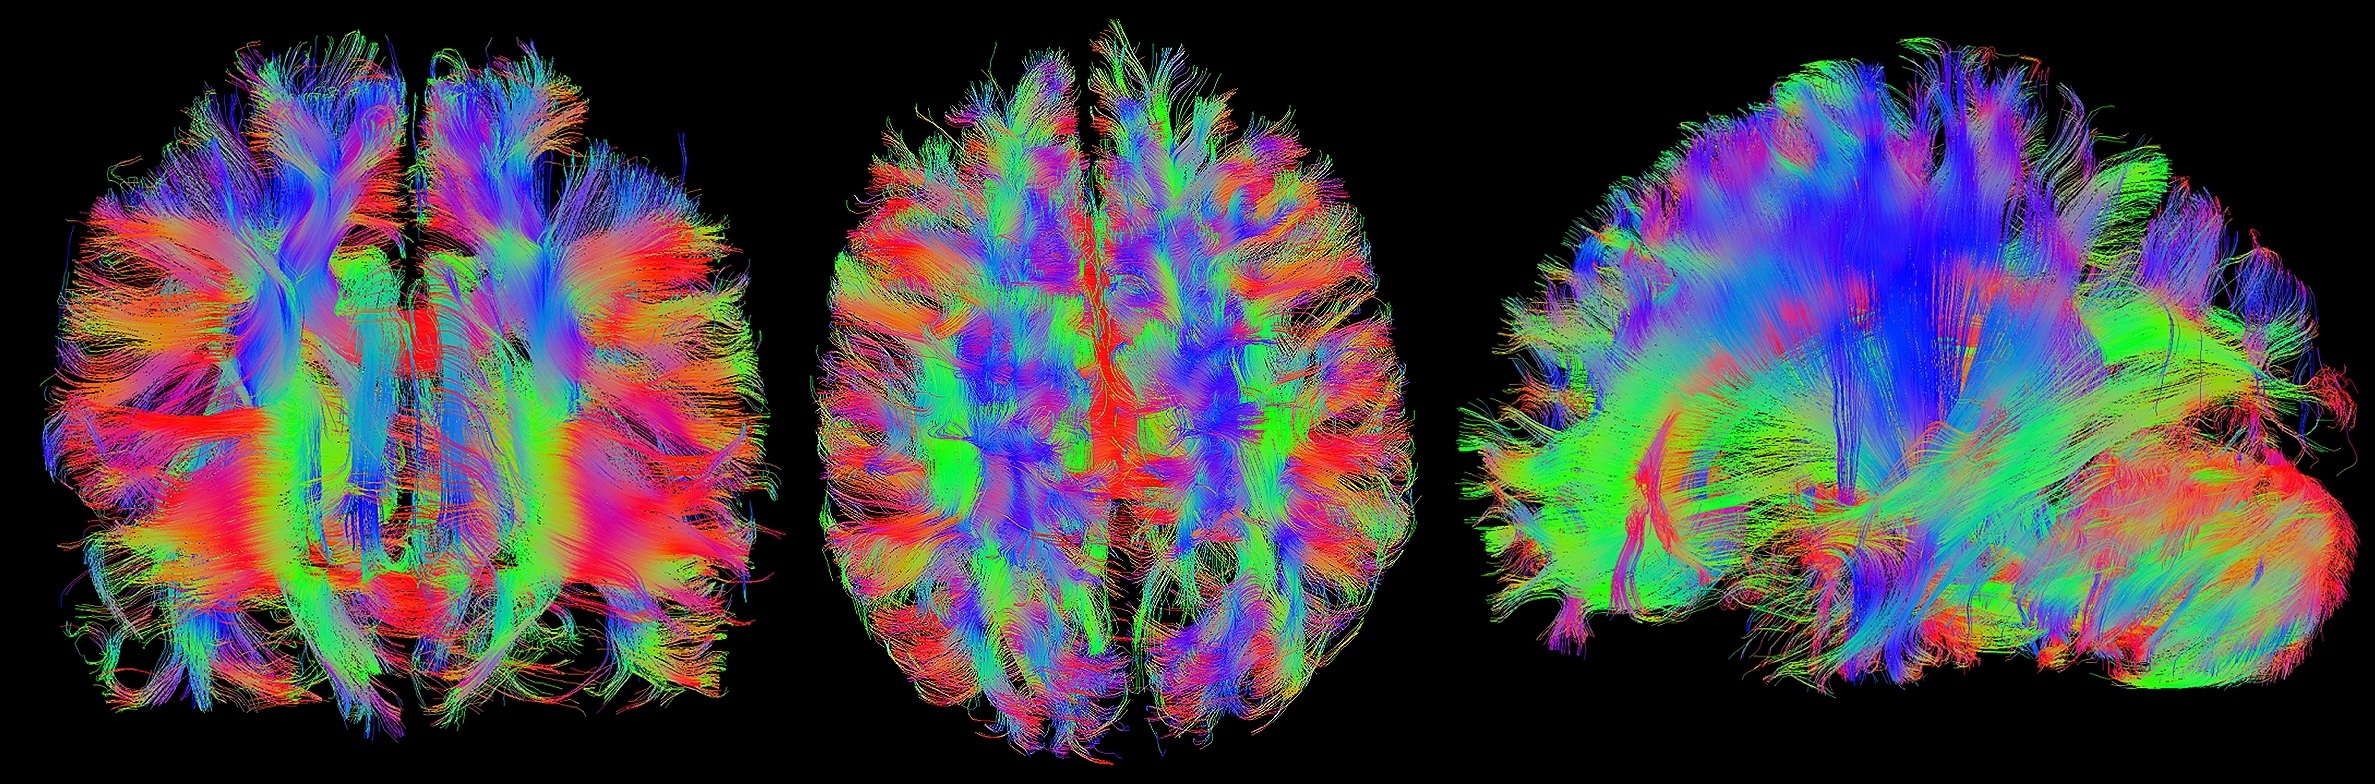 17-MR-brain